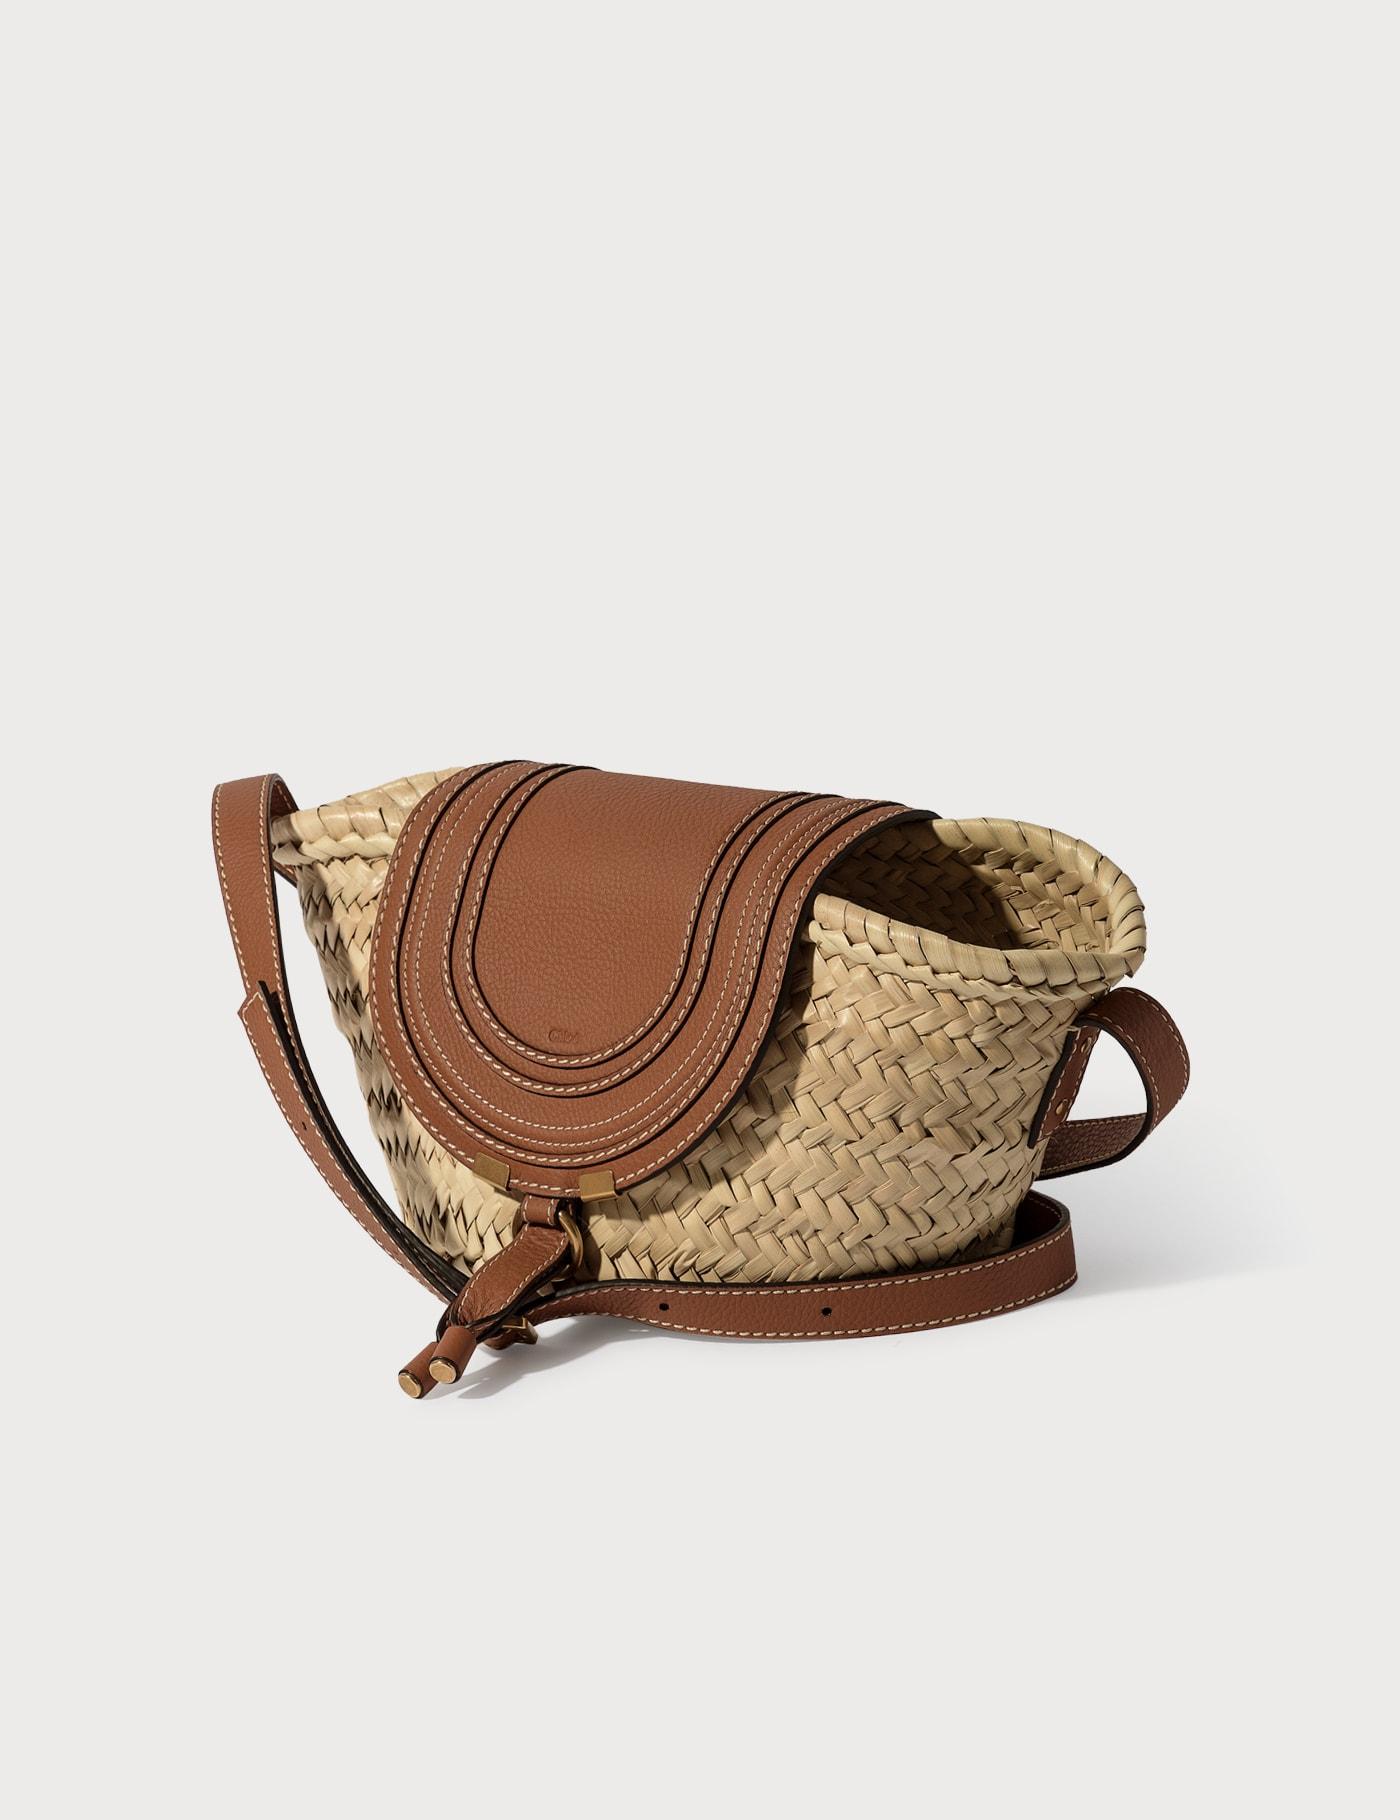 Basket Leather Crossbody Bag